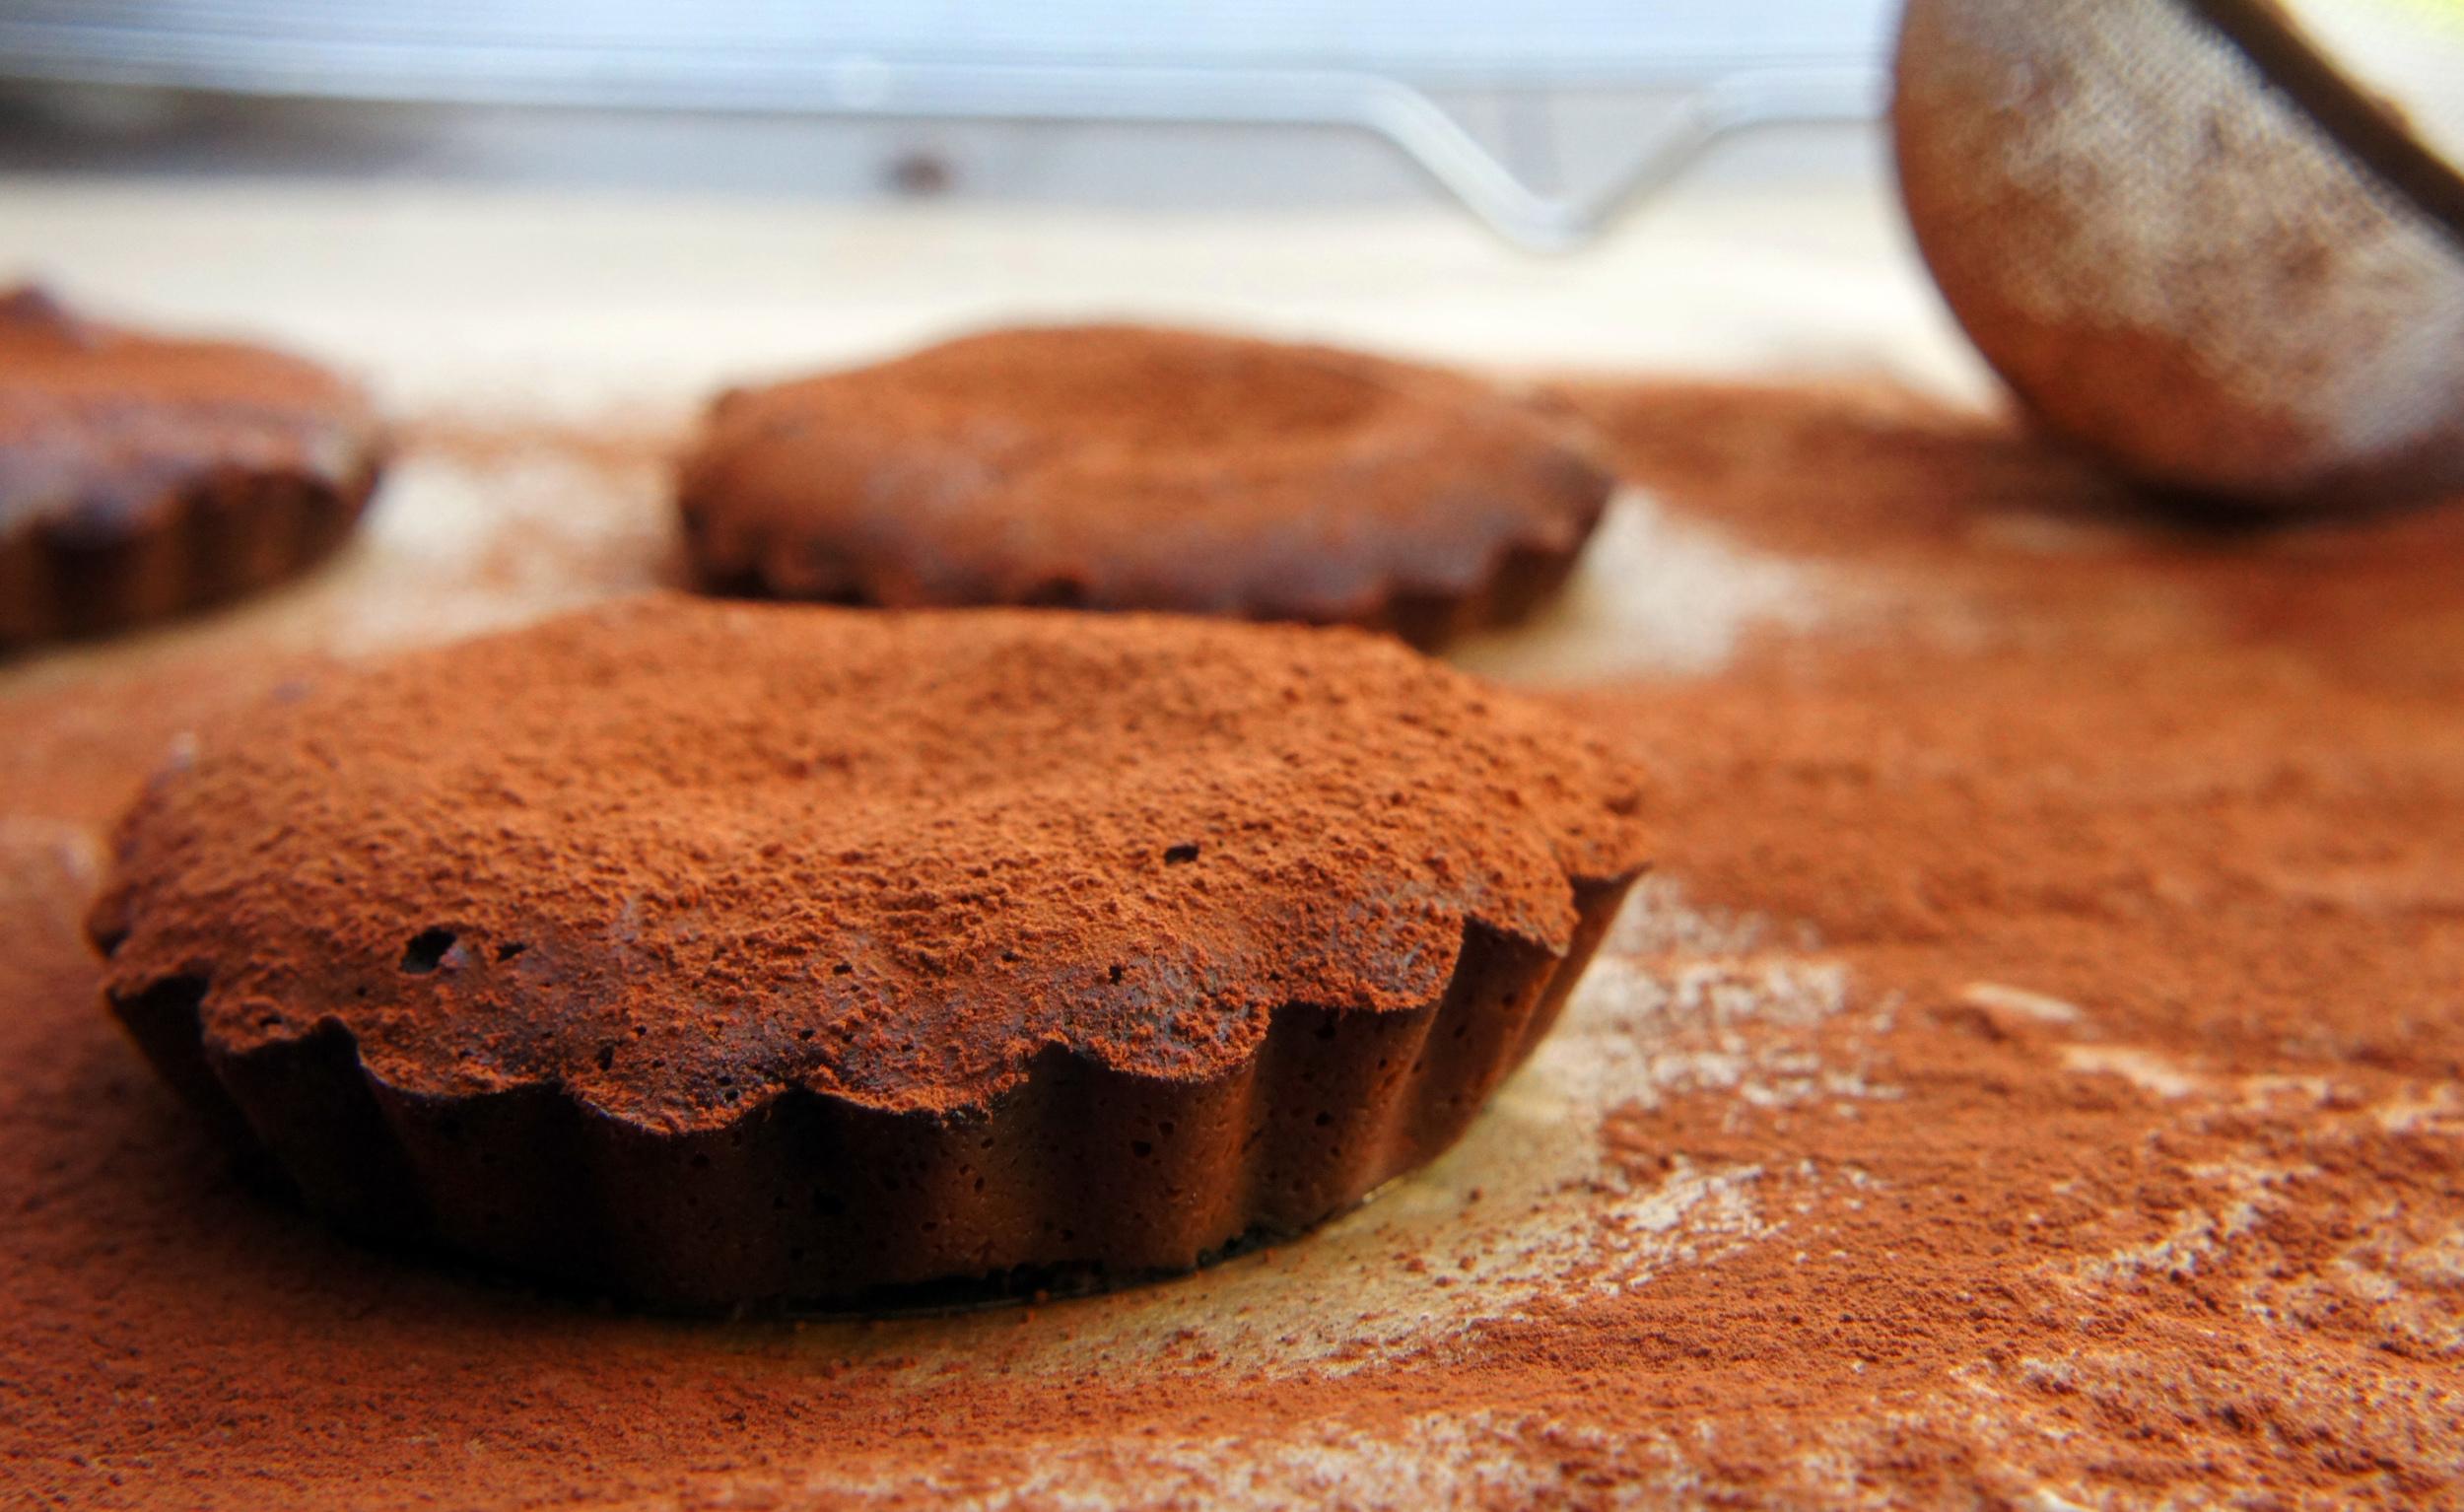 Semi-Sweet Flourless Chocolate Cake: 4 simple ingredients. Gluten-free